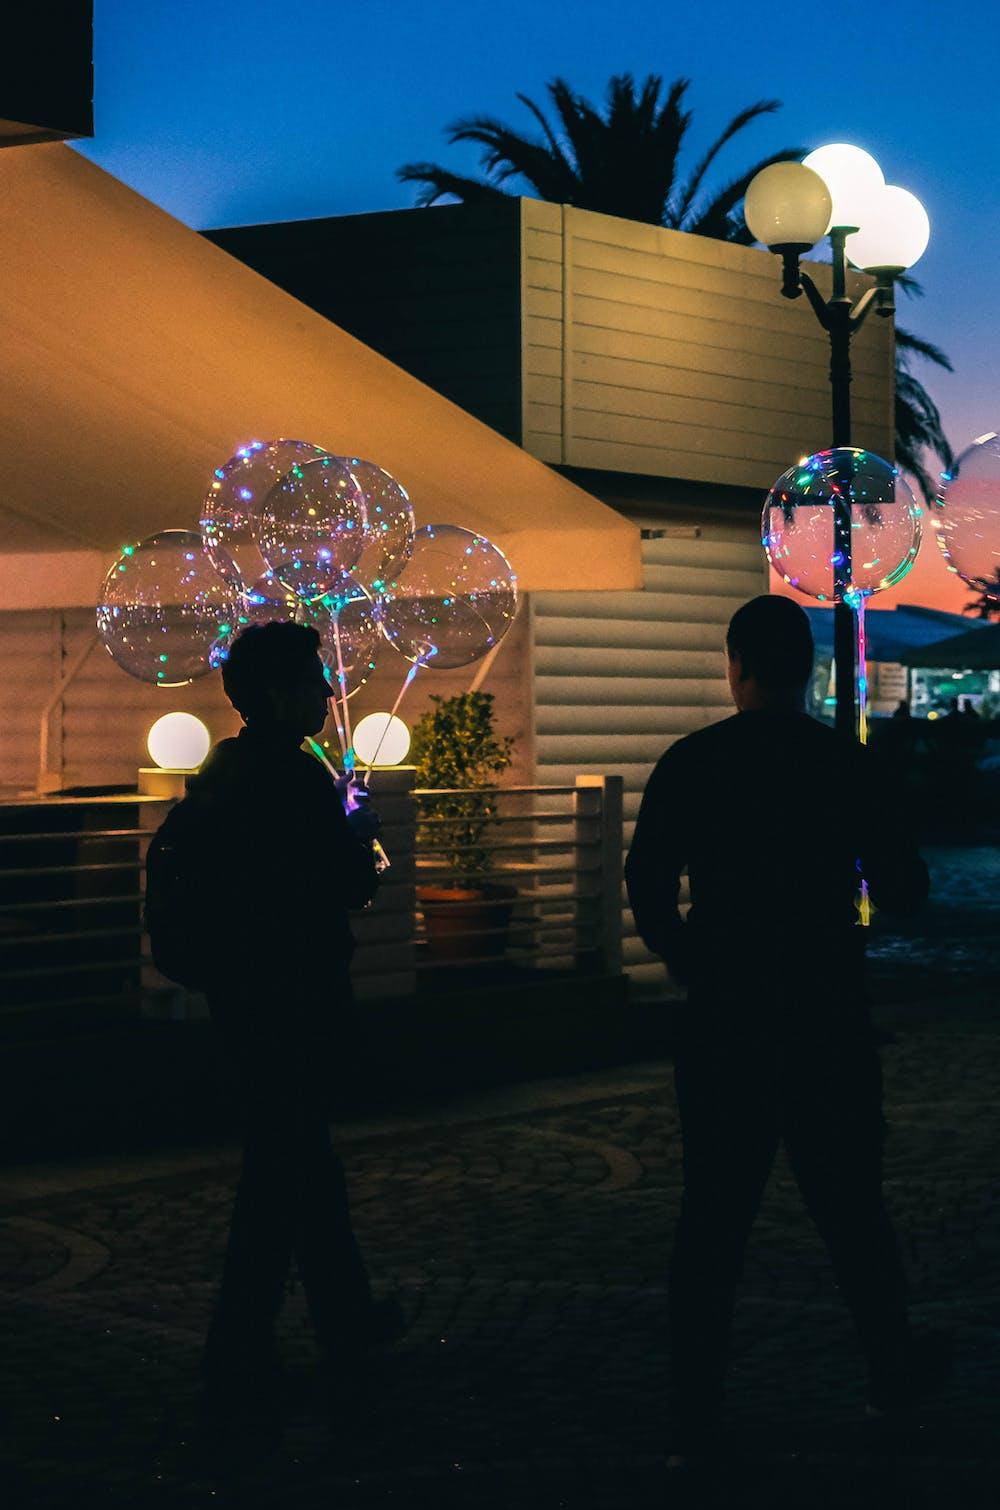 Two men holding balloons. | Photo: Pexels